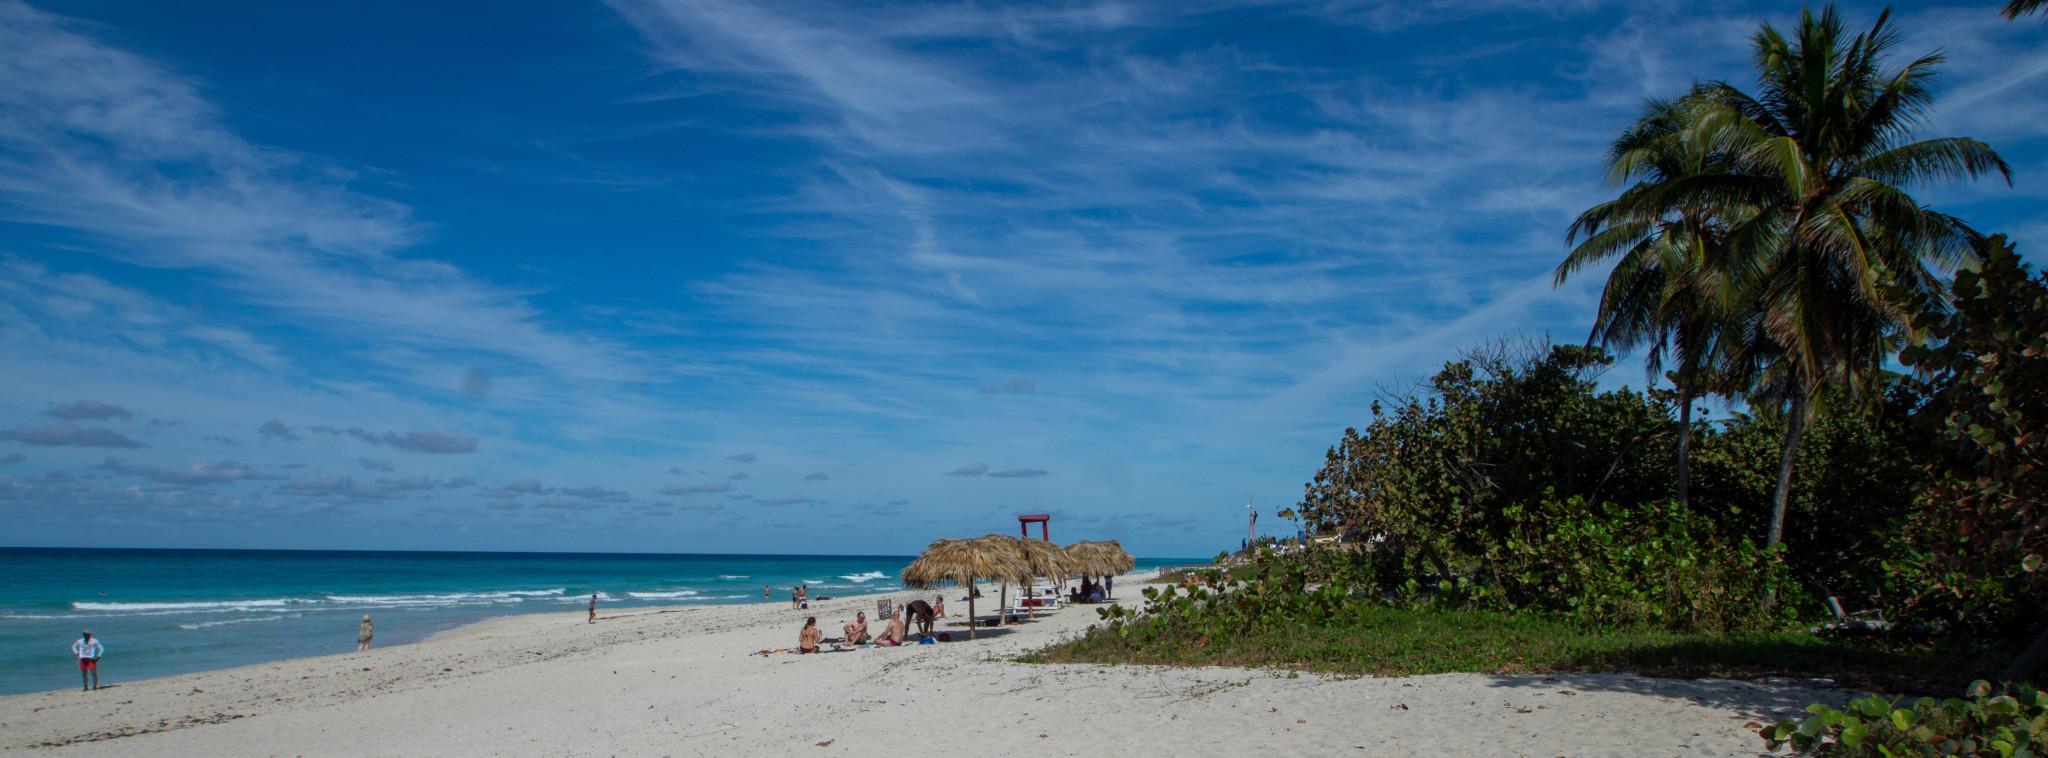 Playa Varadero Kuba Reisetipps